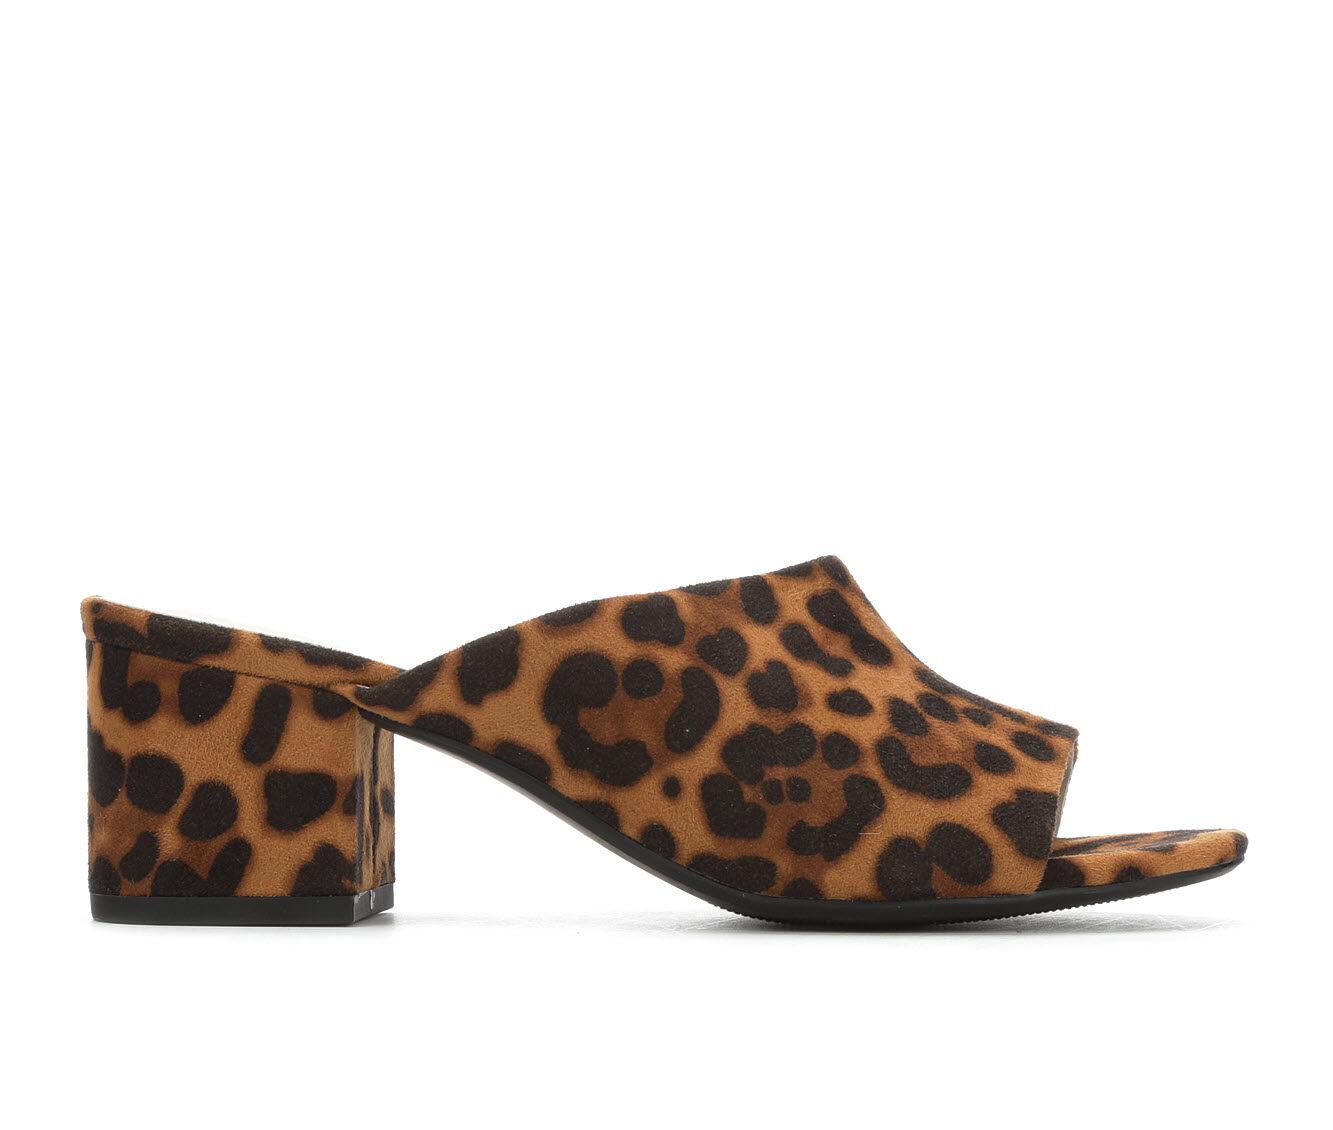 buy classic Women's Anne Klein Sport Babs Dress Sandals Leopard